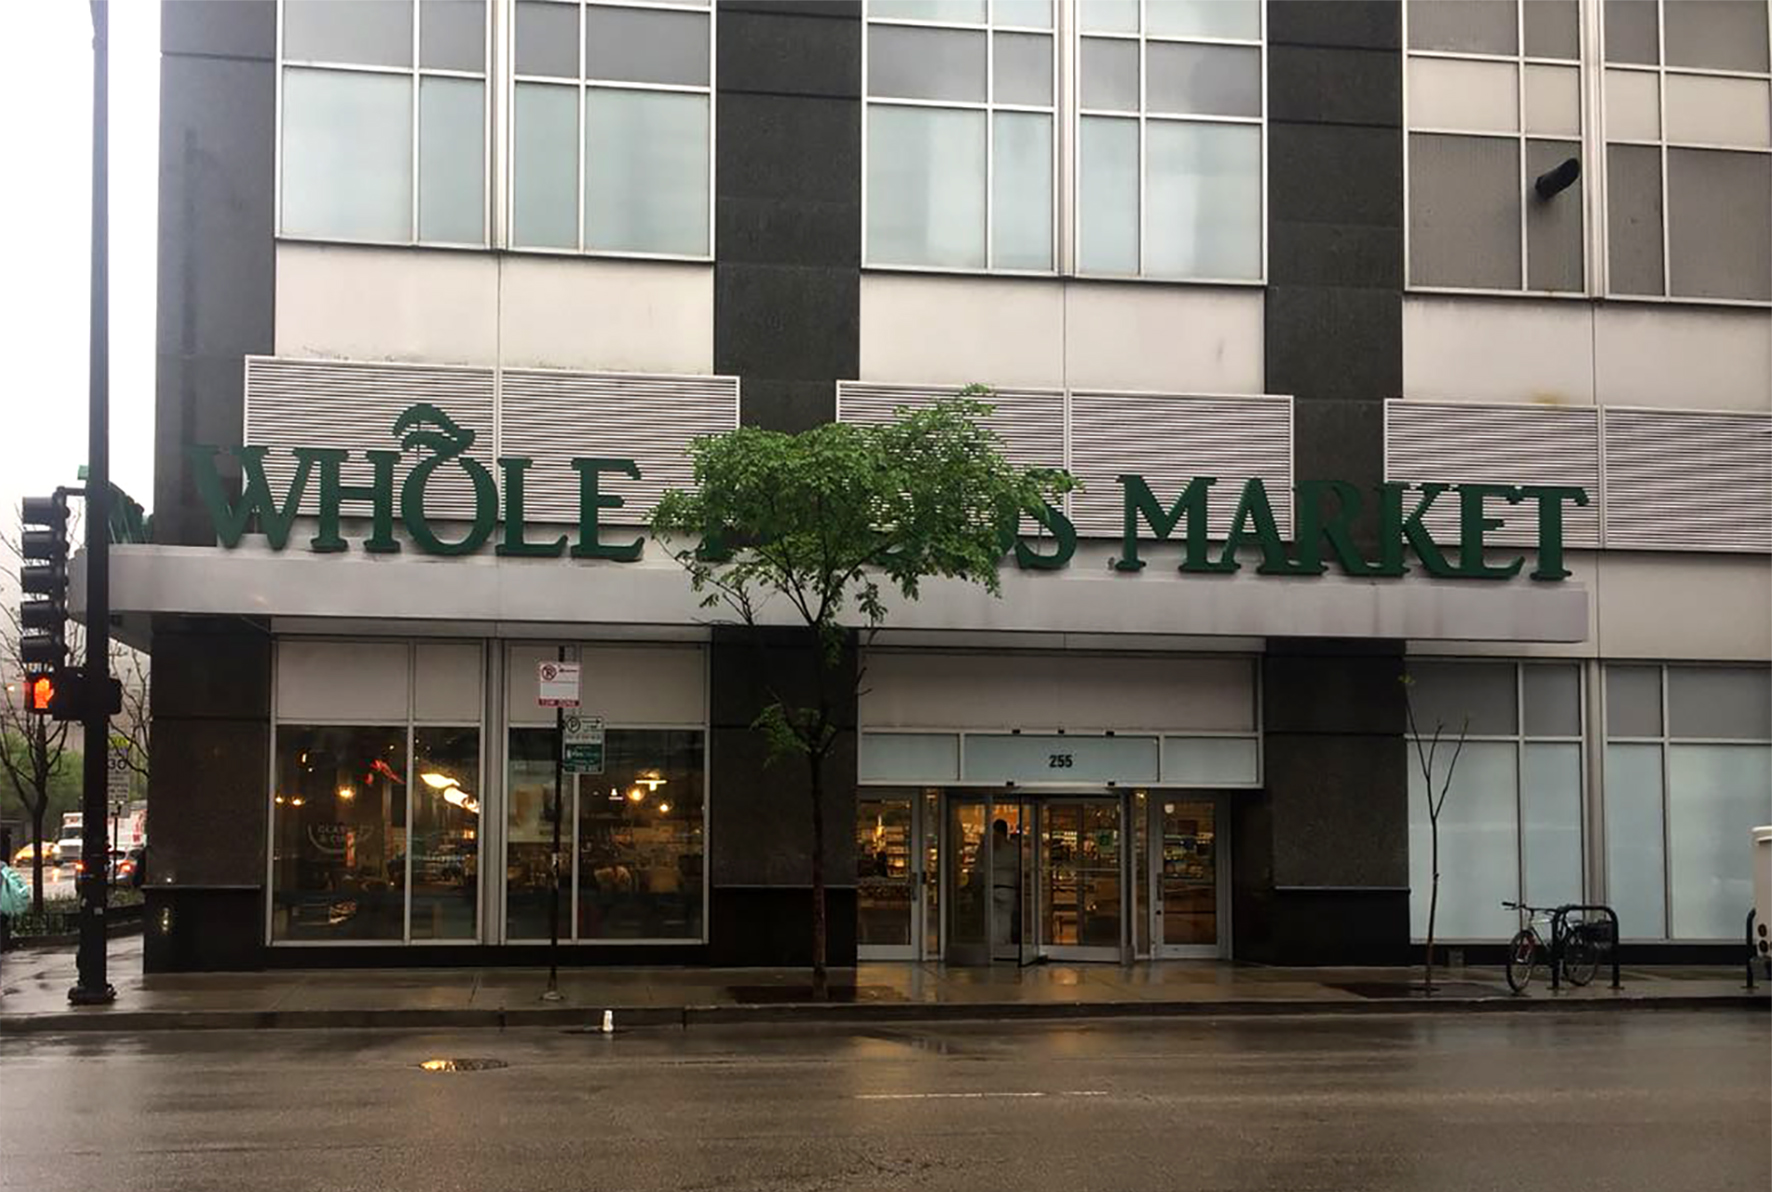 Whole Foods Market, Chicago